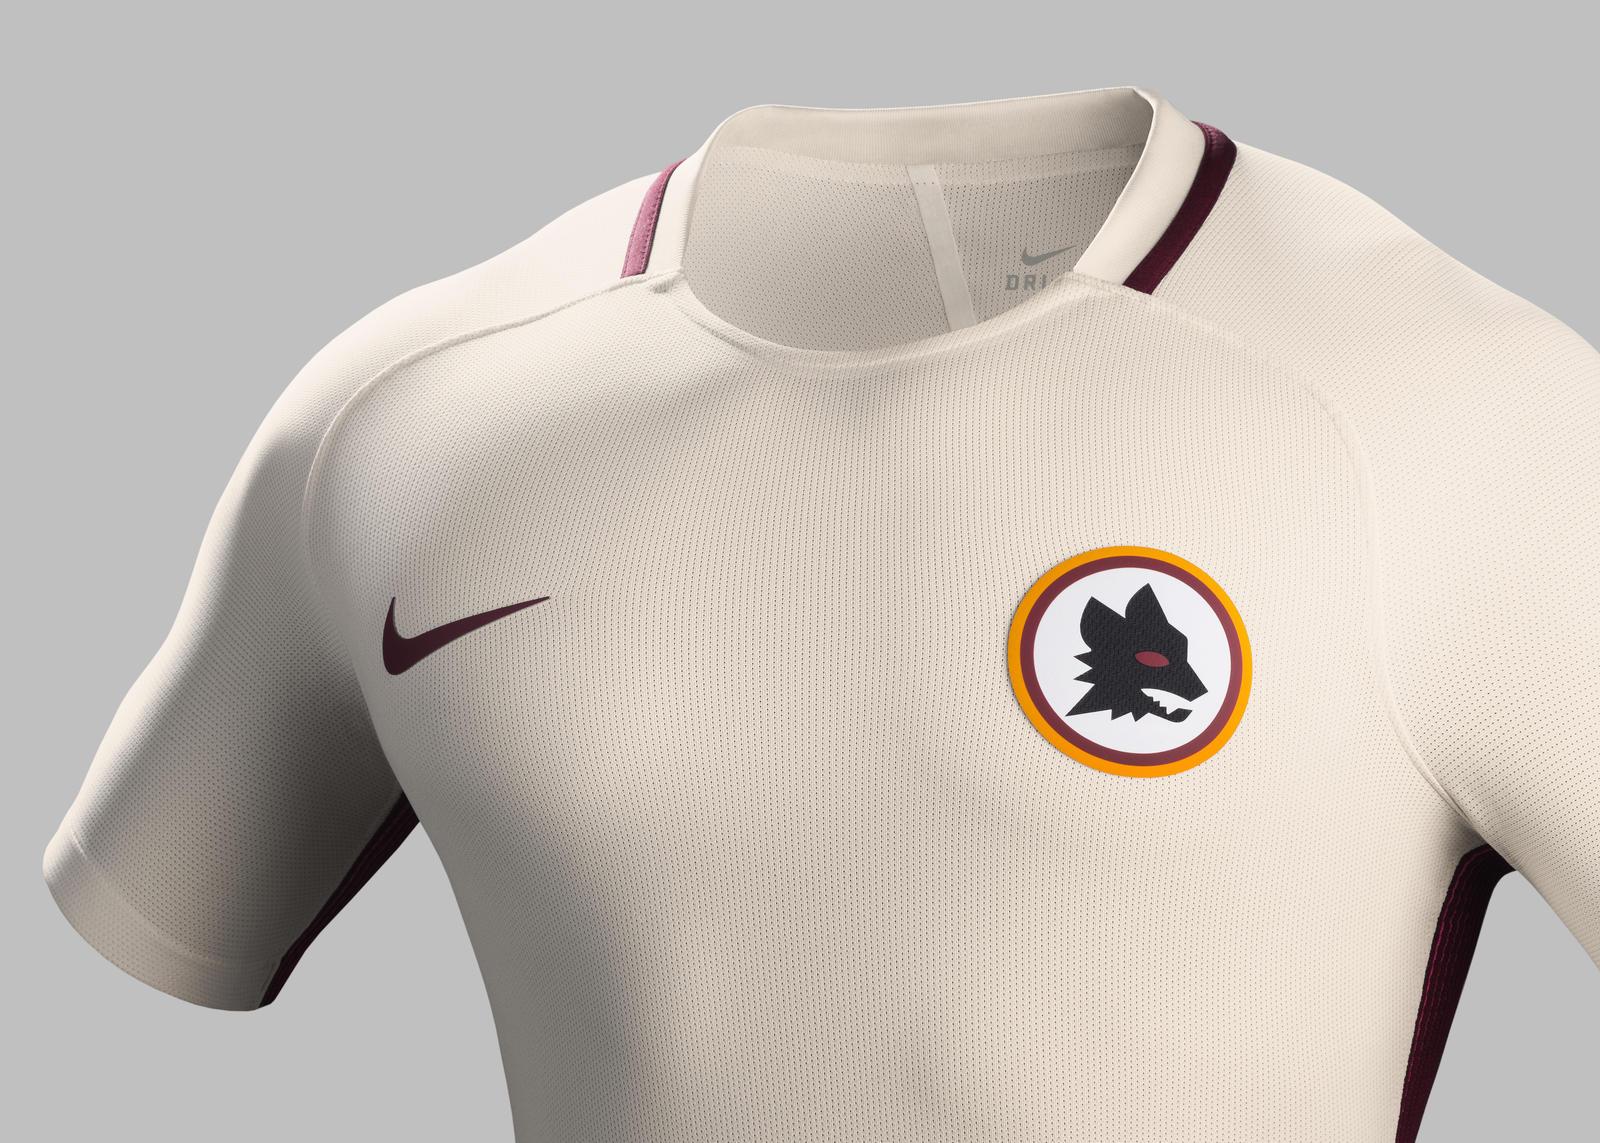 Su16_CK_Comms_A_Crest_Match_AS Roma_R